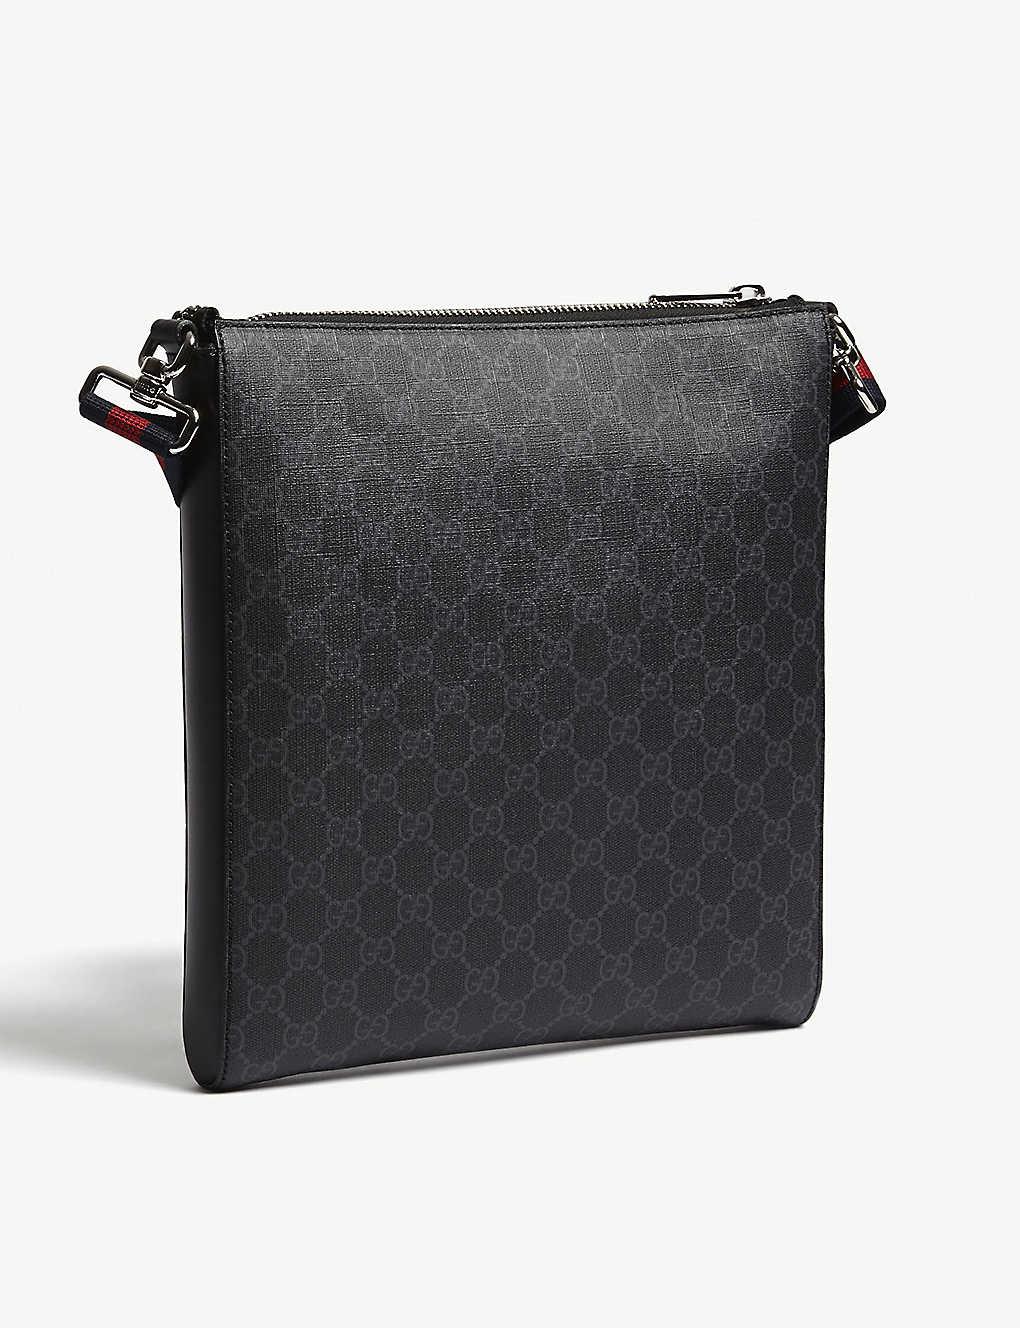 888e3e13696c GUCCI - GG Supreme patches messenger bag   Selfridges.com